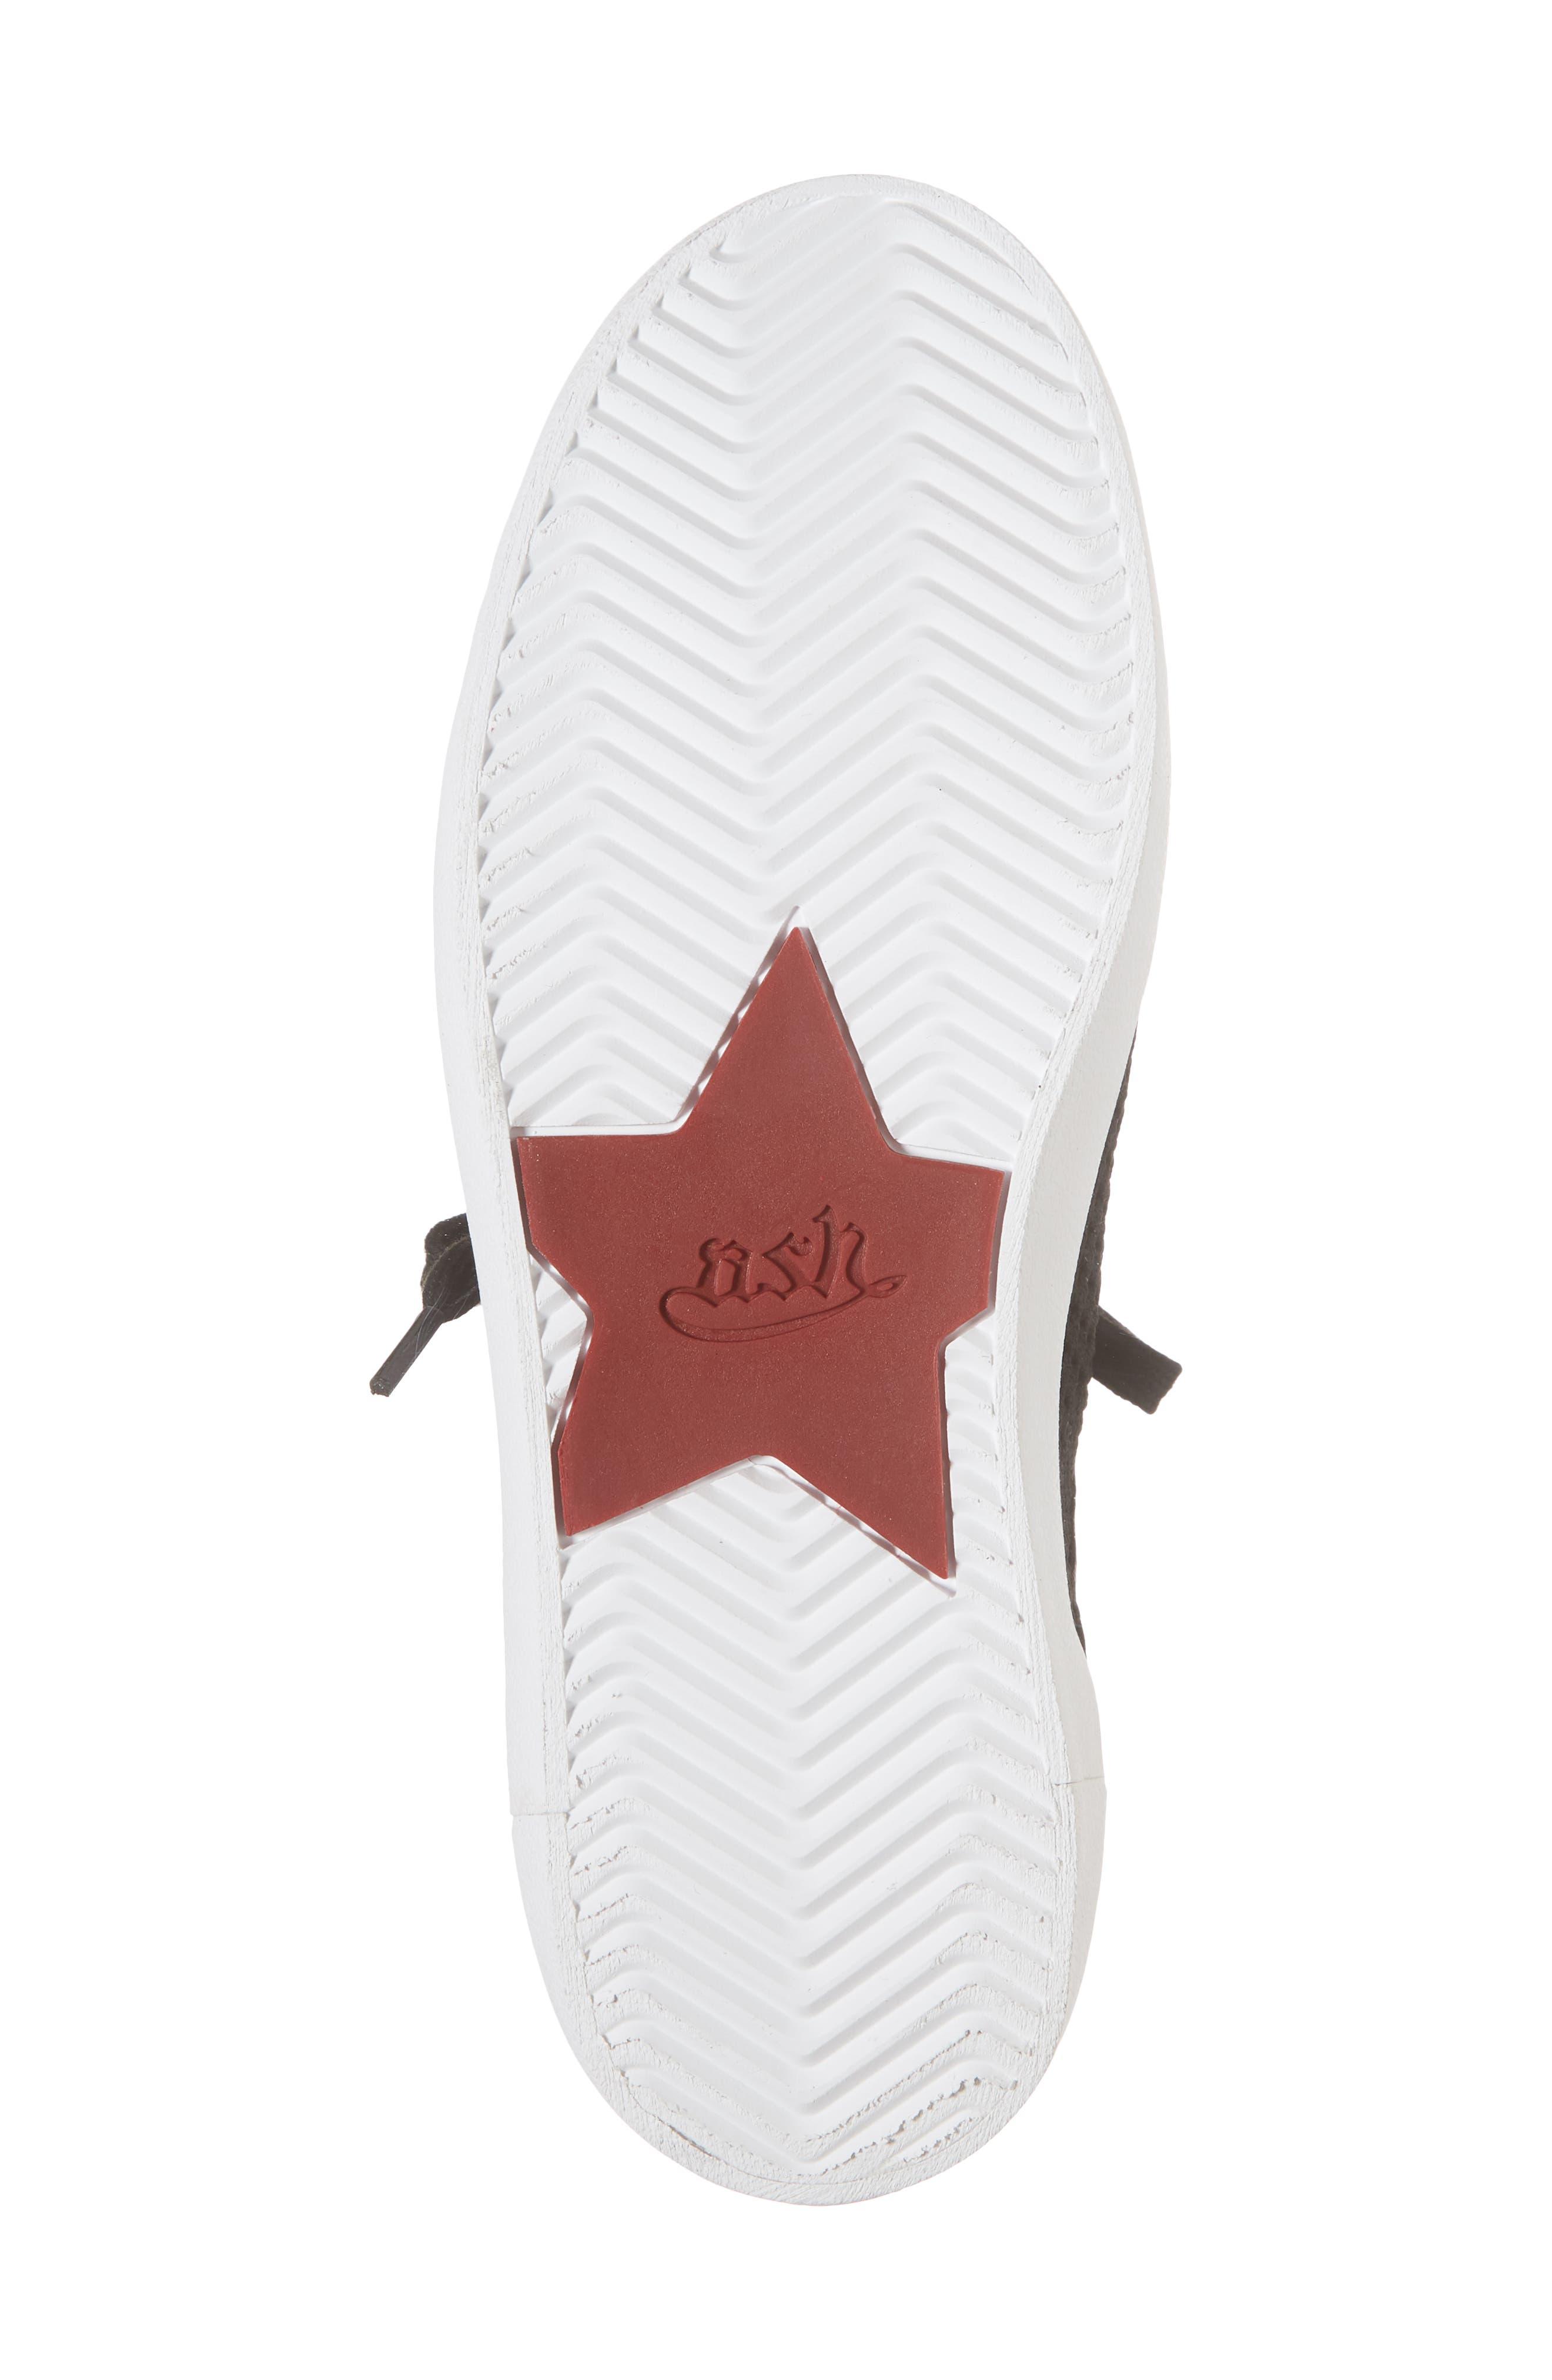 Nolita Mid Top Sock Sneaker,                             Alternate thumbnail 6, color,                             001